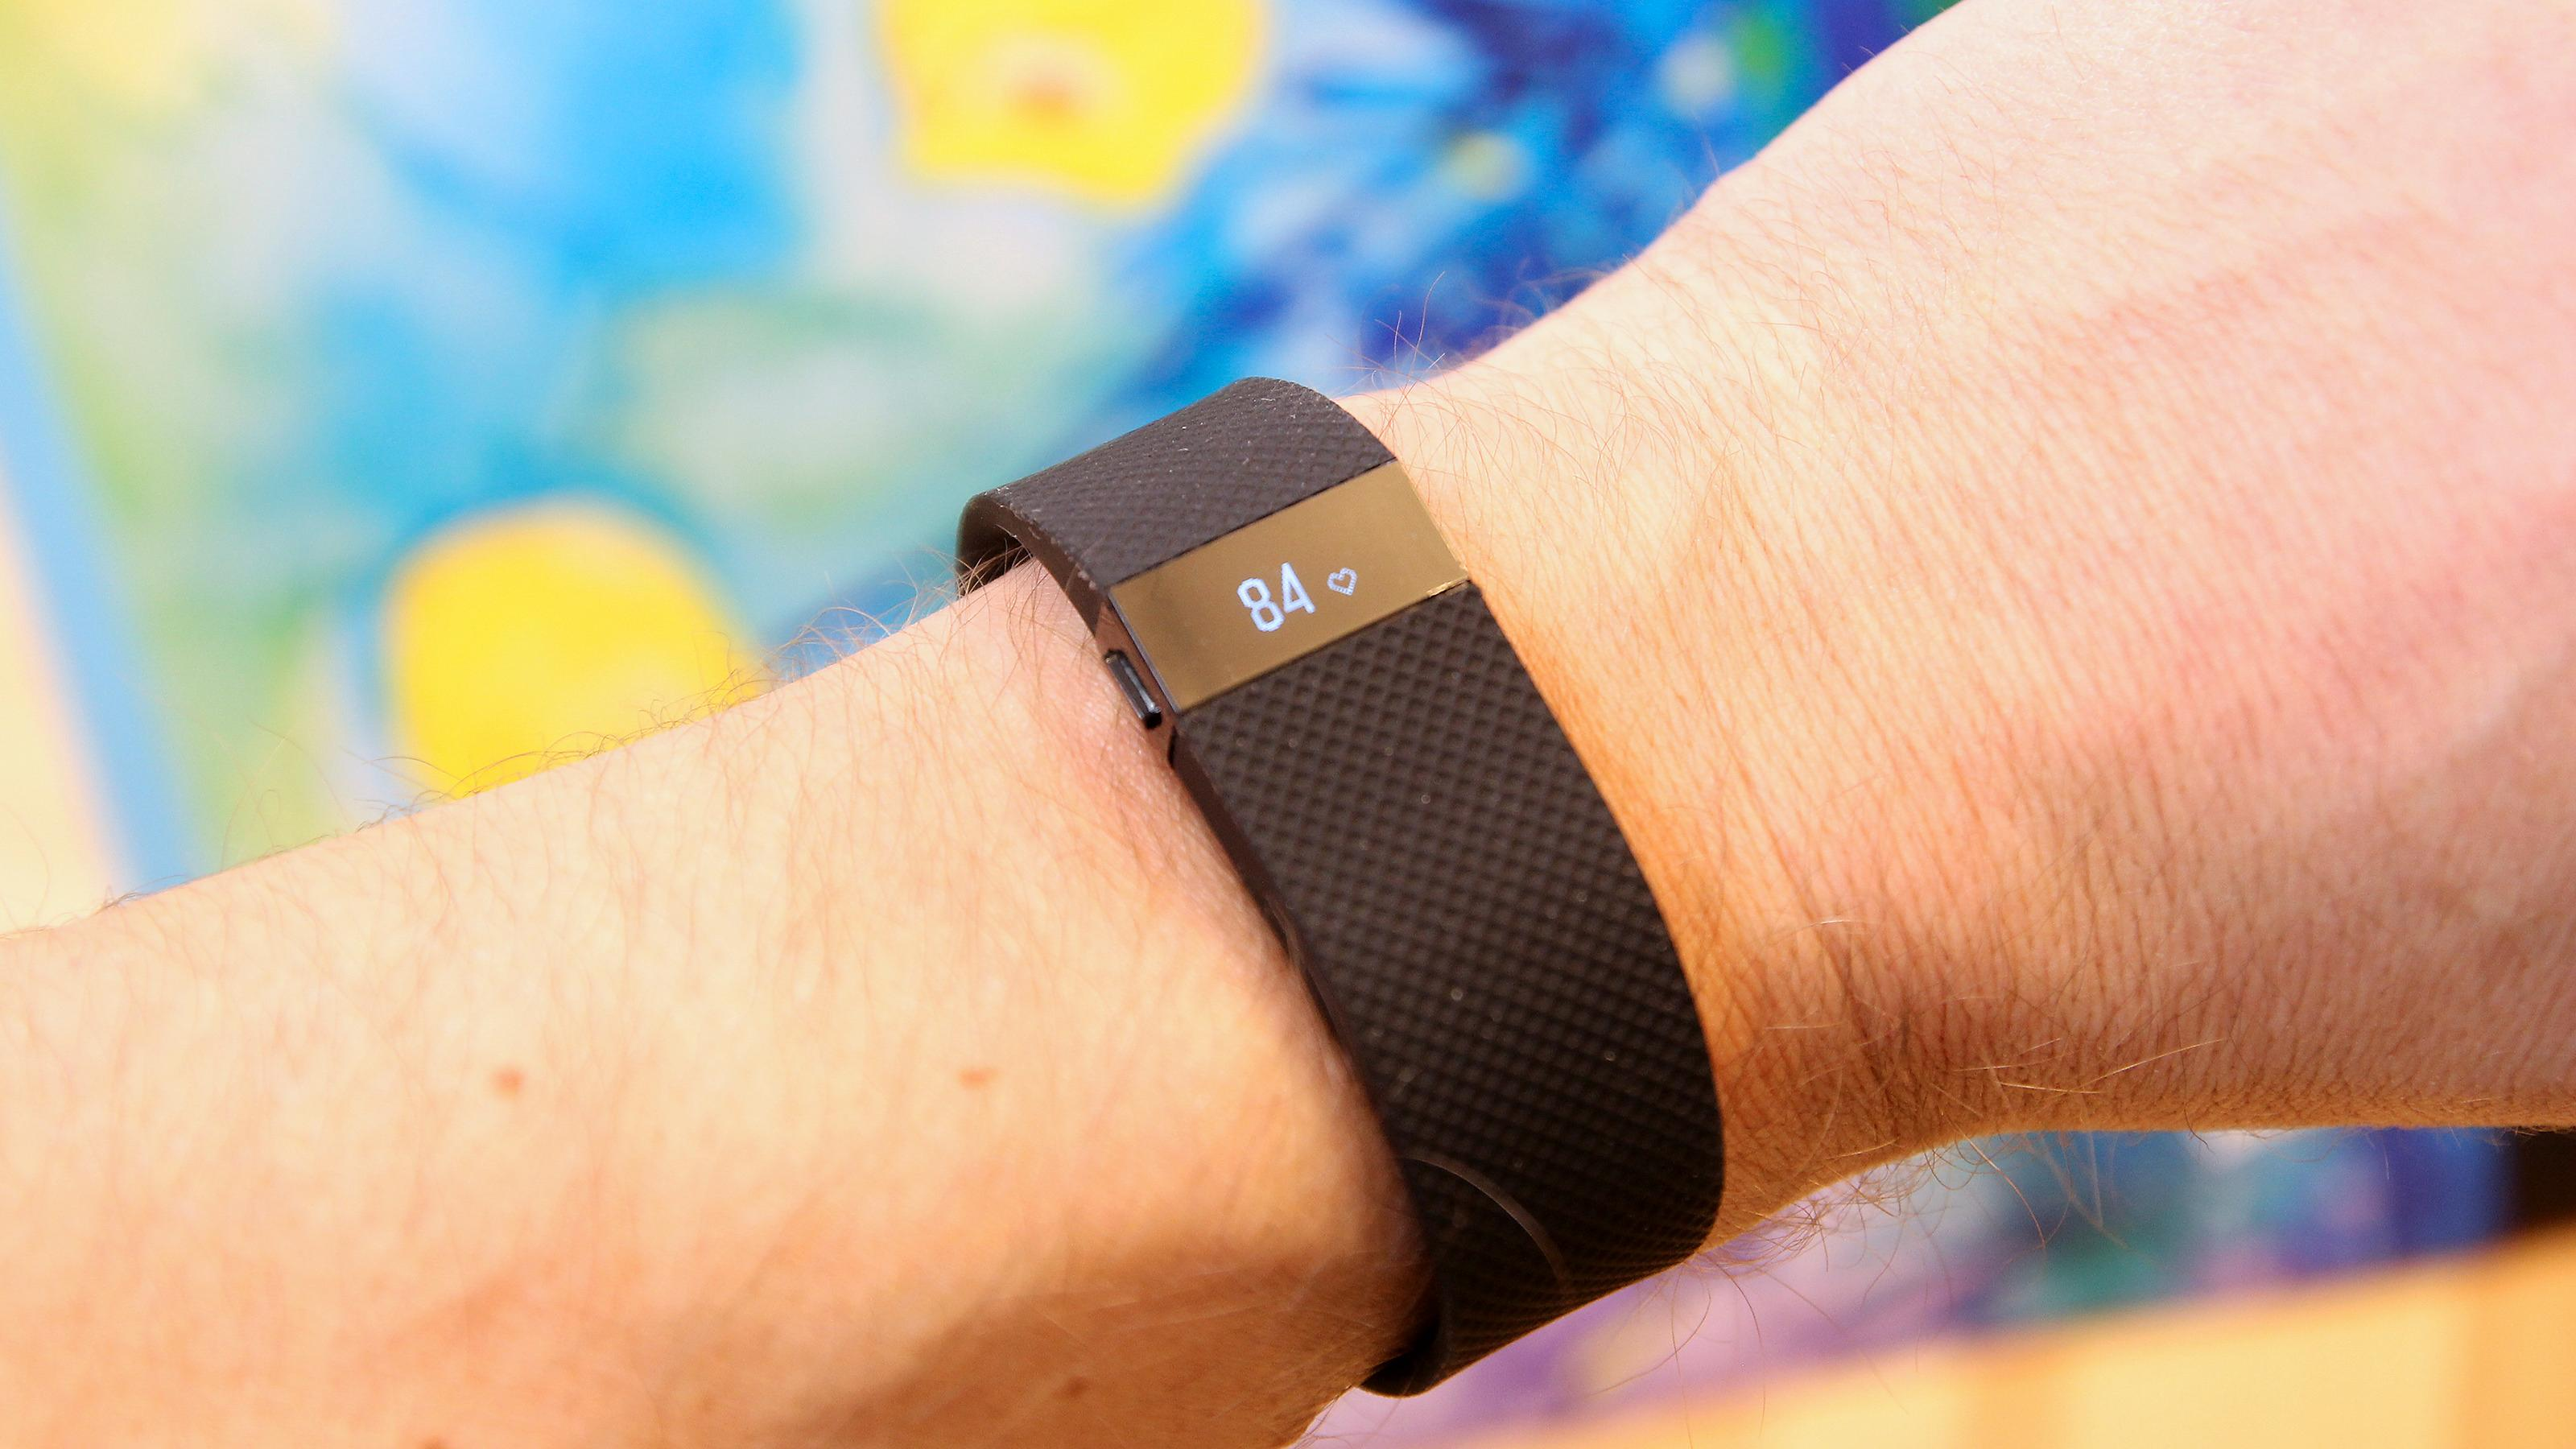 Fitbit Charge HR måler nesten alt. Foto: Kurt Lekanger, Tek.no